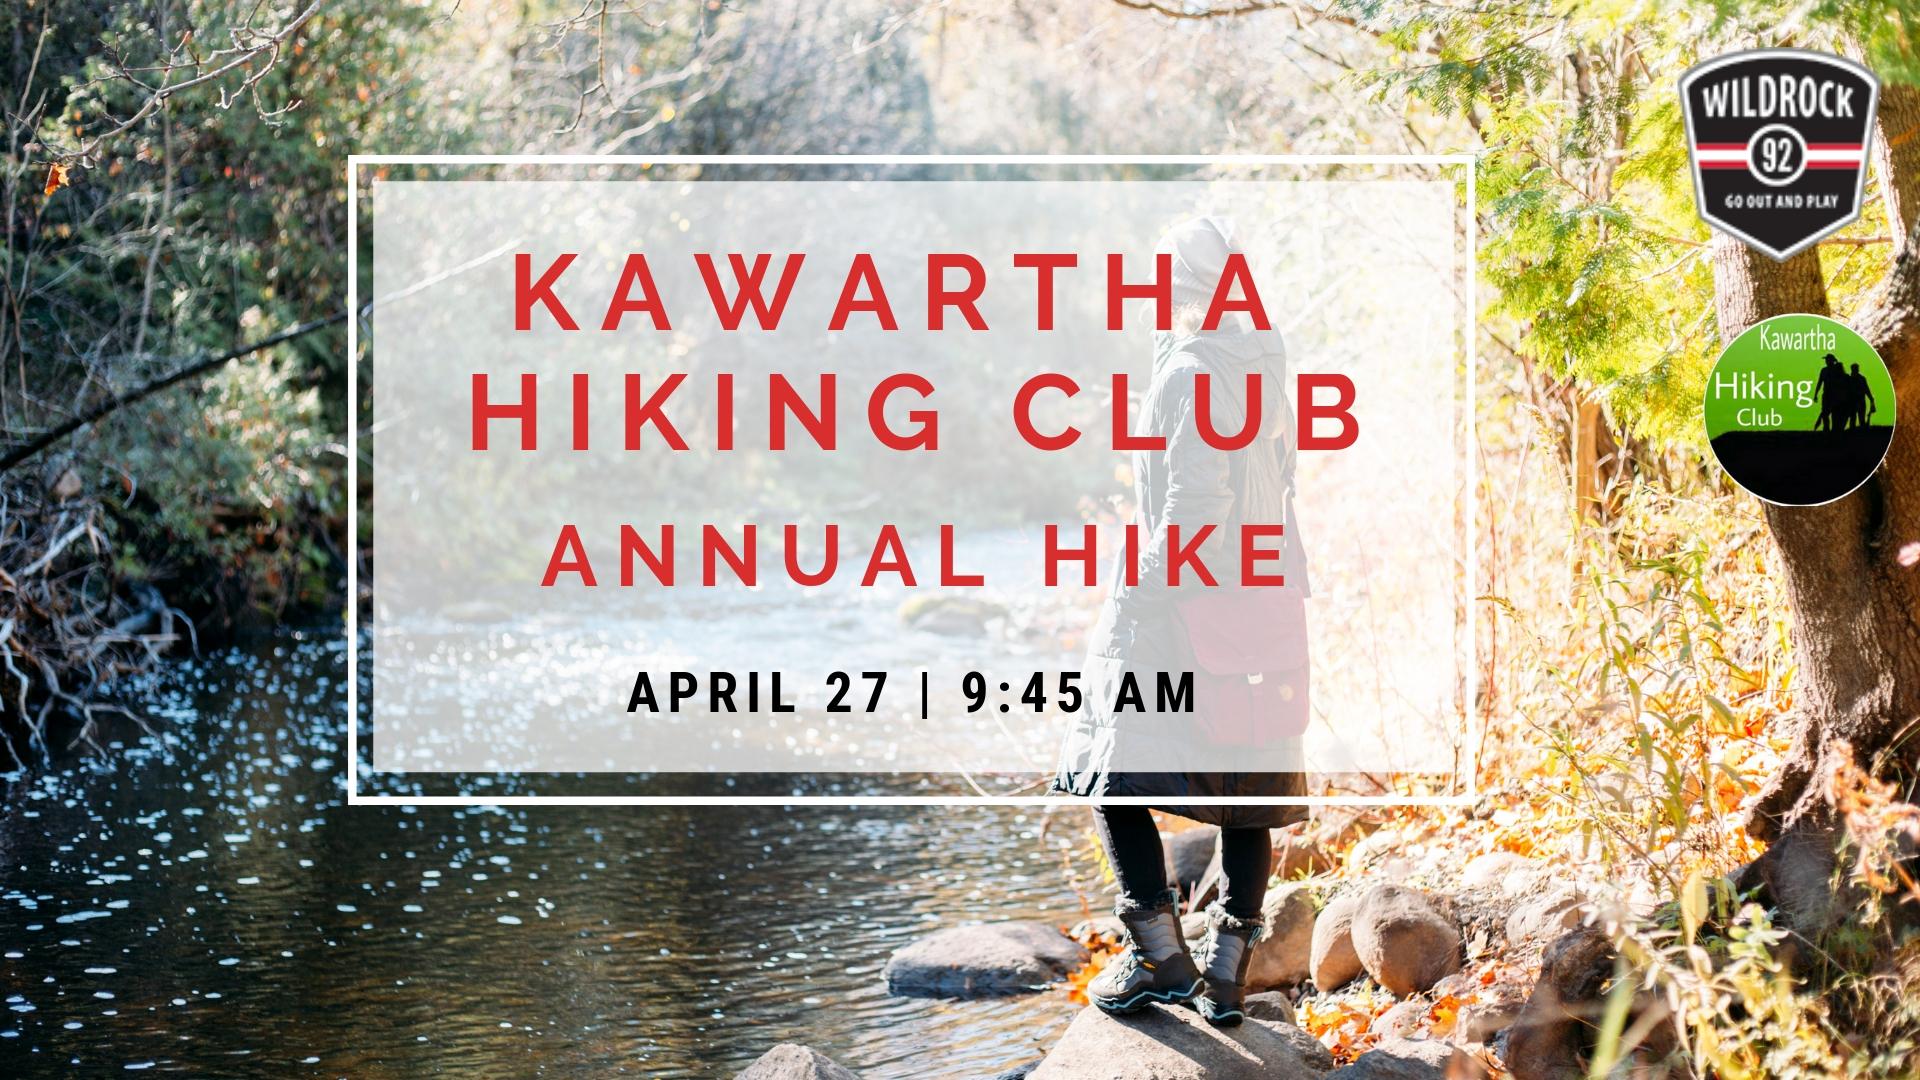 hiking club fb event.jpg